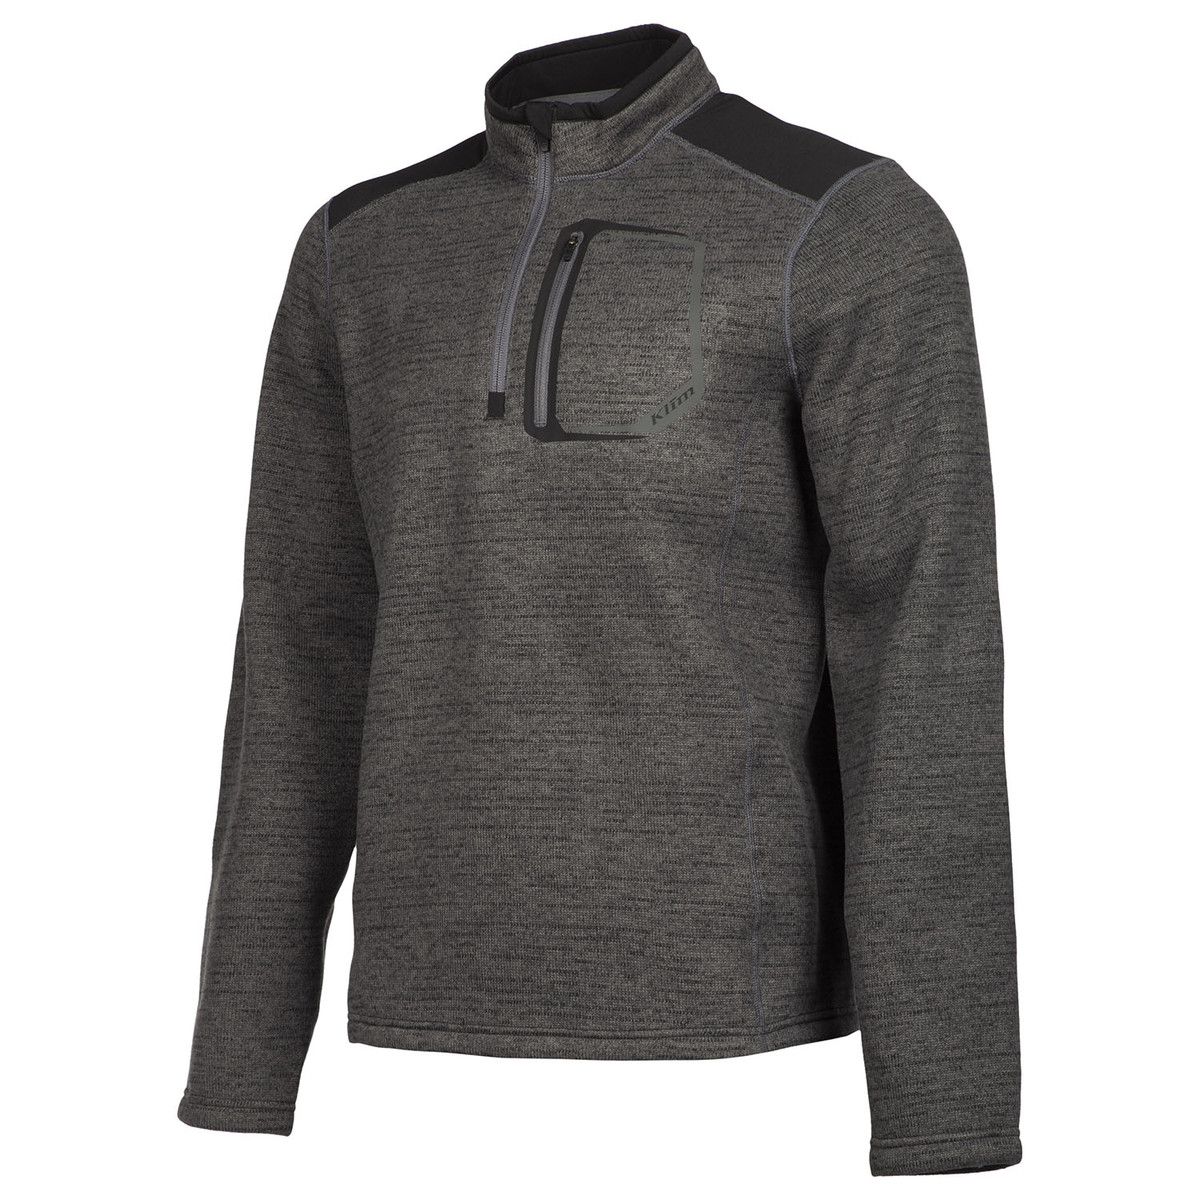 Yukon Black Sweater Front Side